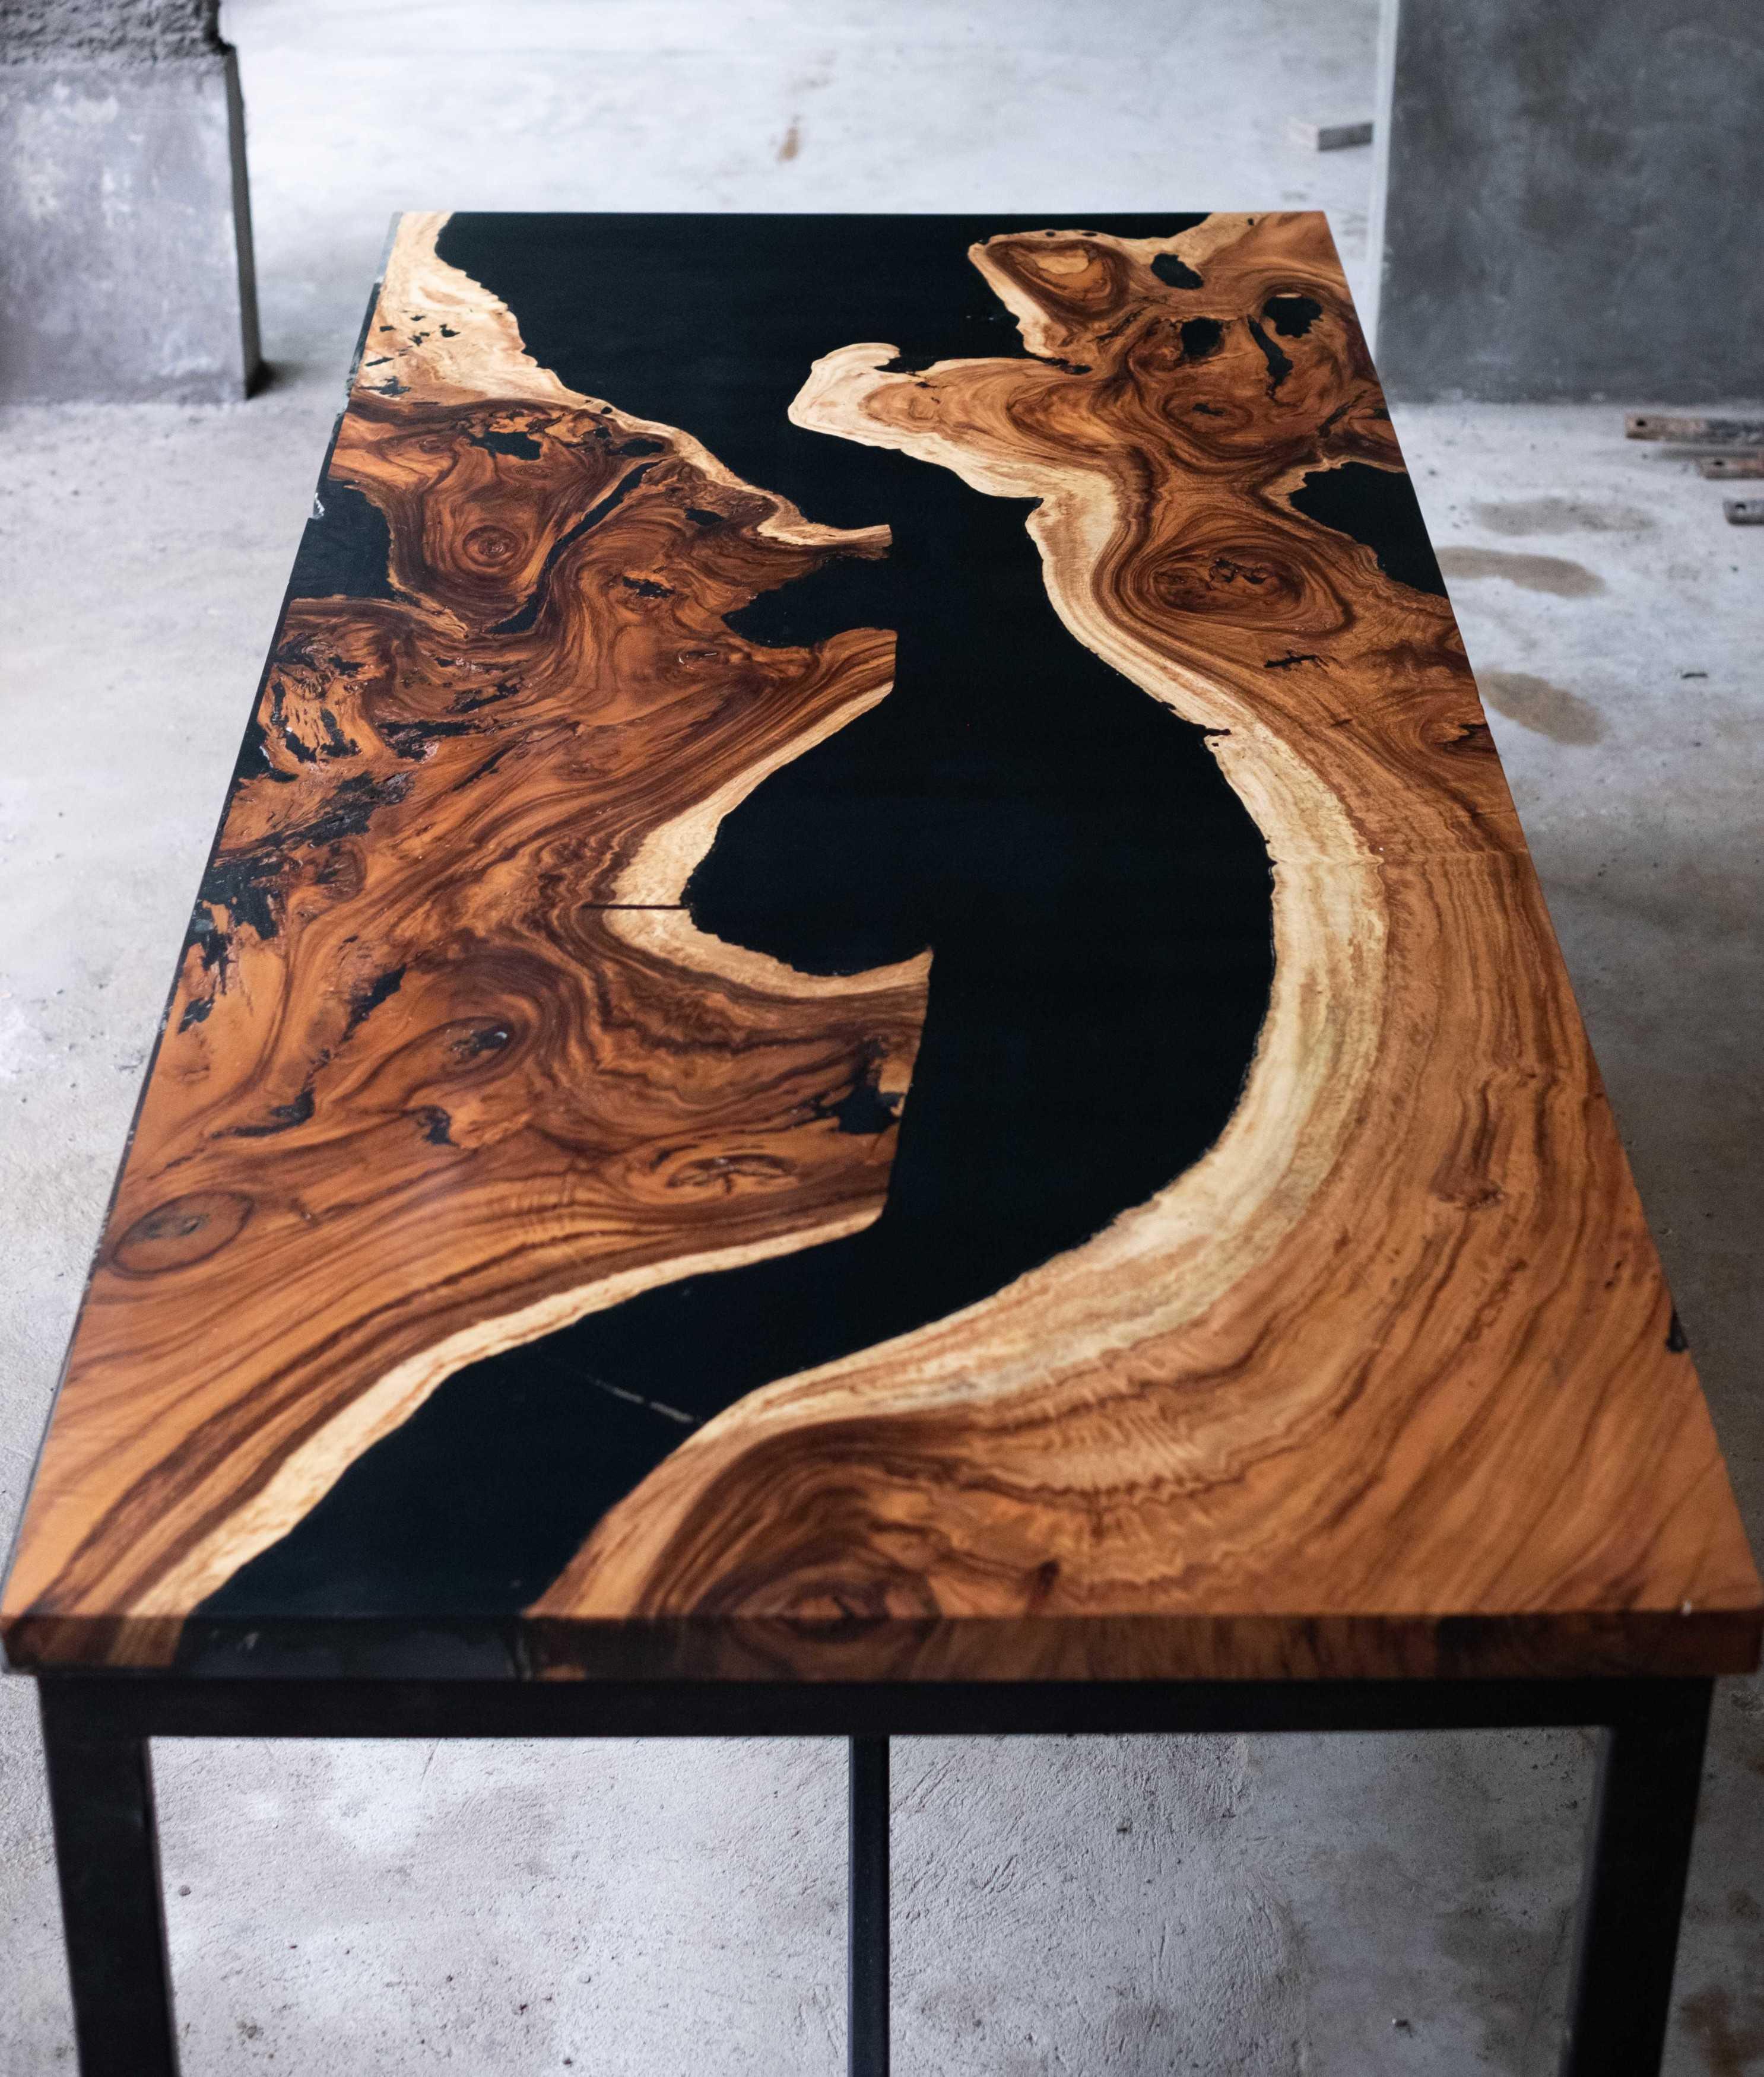 Rootslab Furniture & Craft Project Bekasi, Kota Bks, Jawa Barat, Indonesia Bekasi, Kota Bks, Jawa Barat, Indonesia Rootslab's Tamarind Wood (Trembesi) & Epoxy Resin River Table Industrial  113012